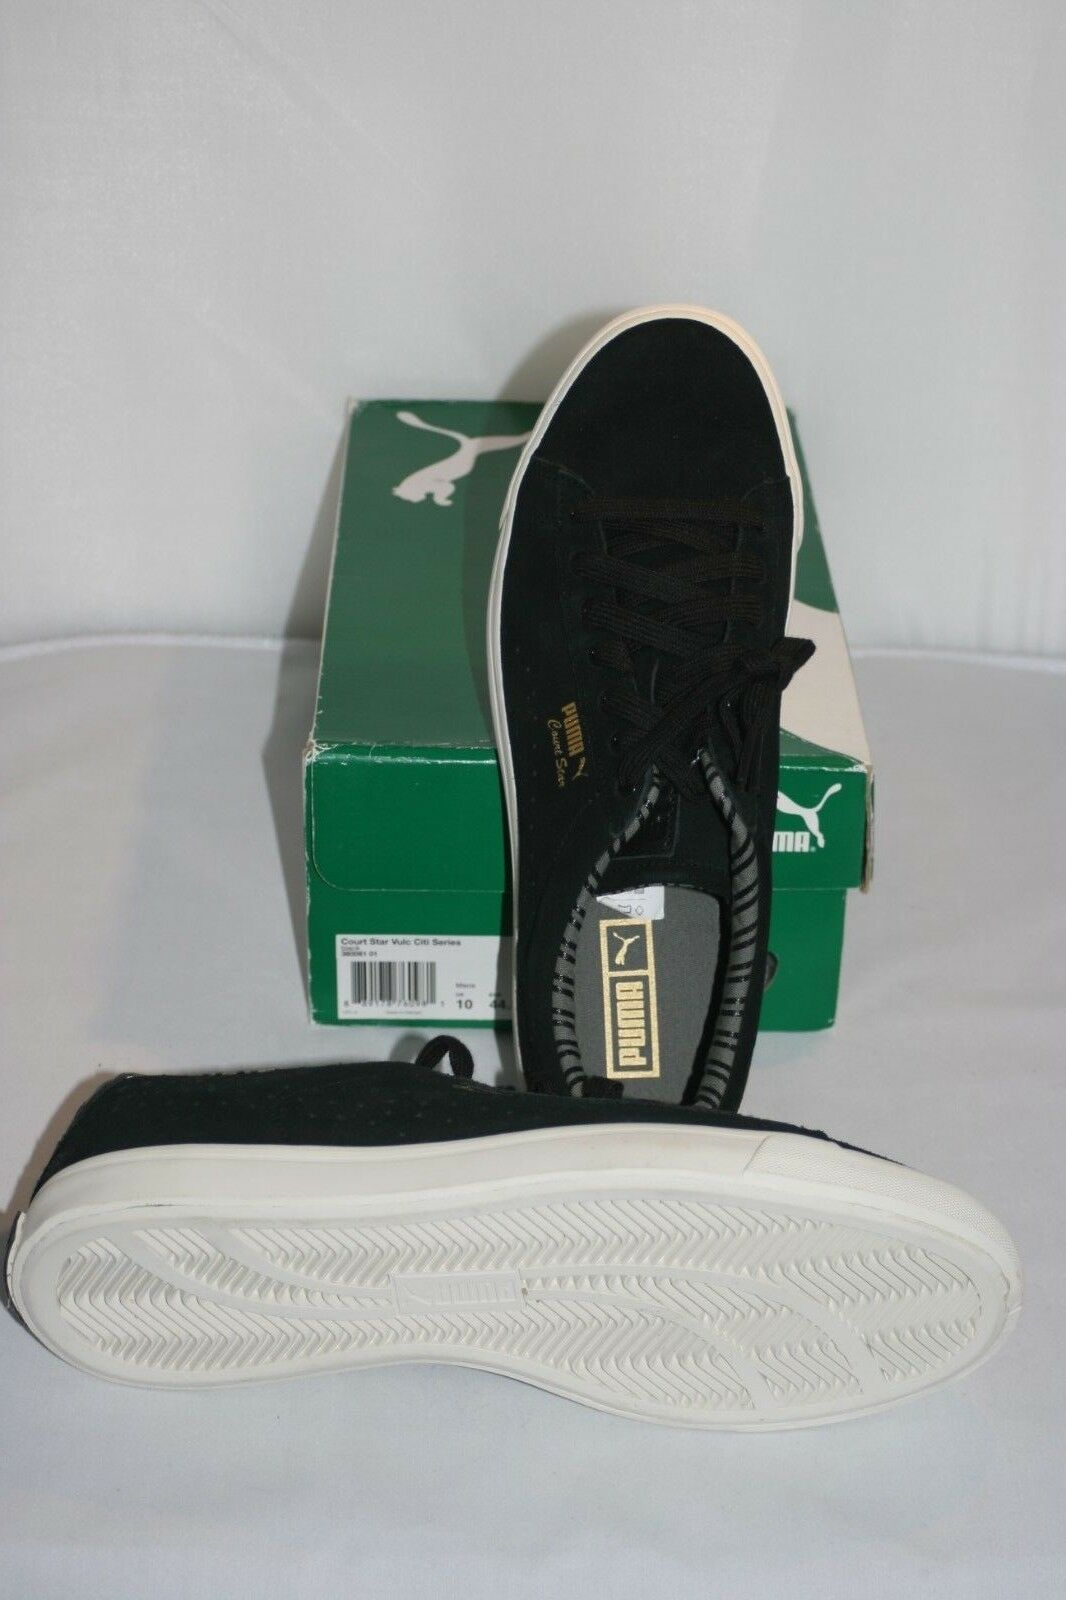 41a586f6c404 PUMA Mens Court Star Vulc Citi Series Fashion SNEAKERS Size 11 Black ...